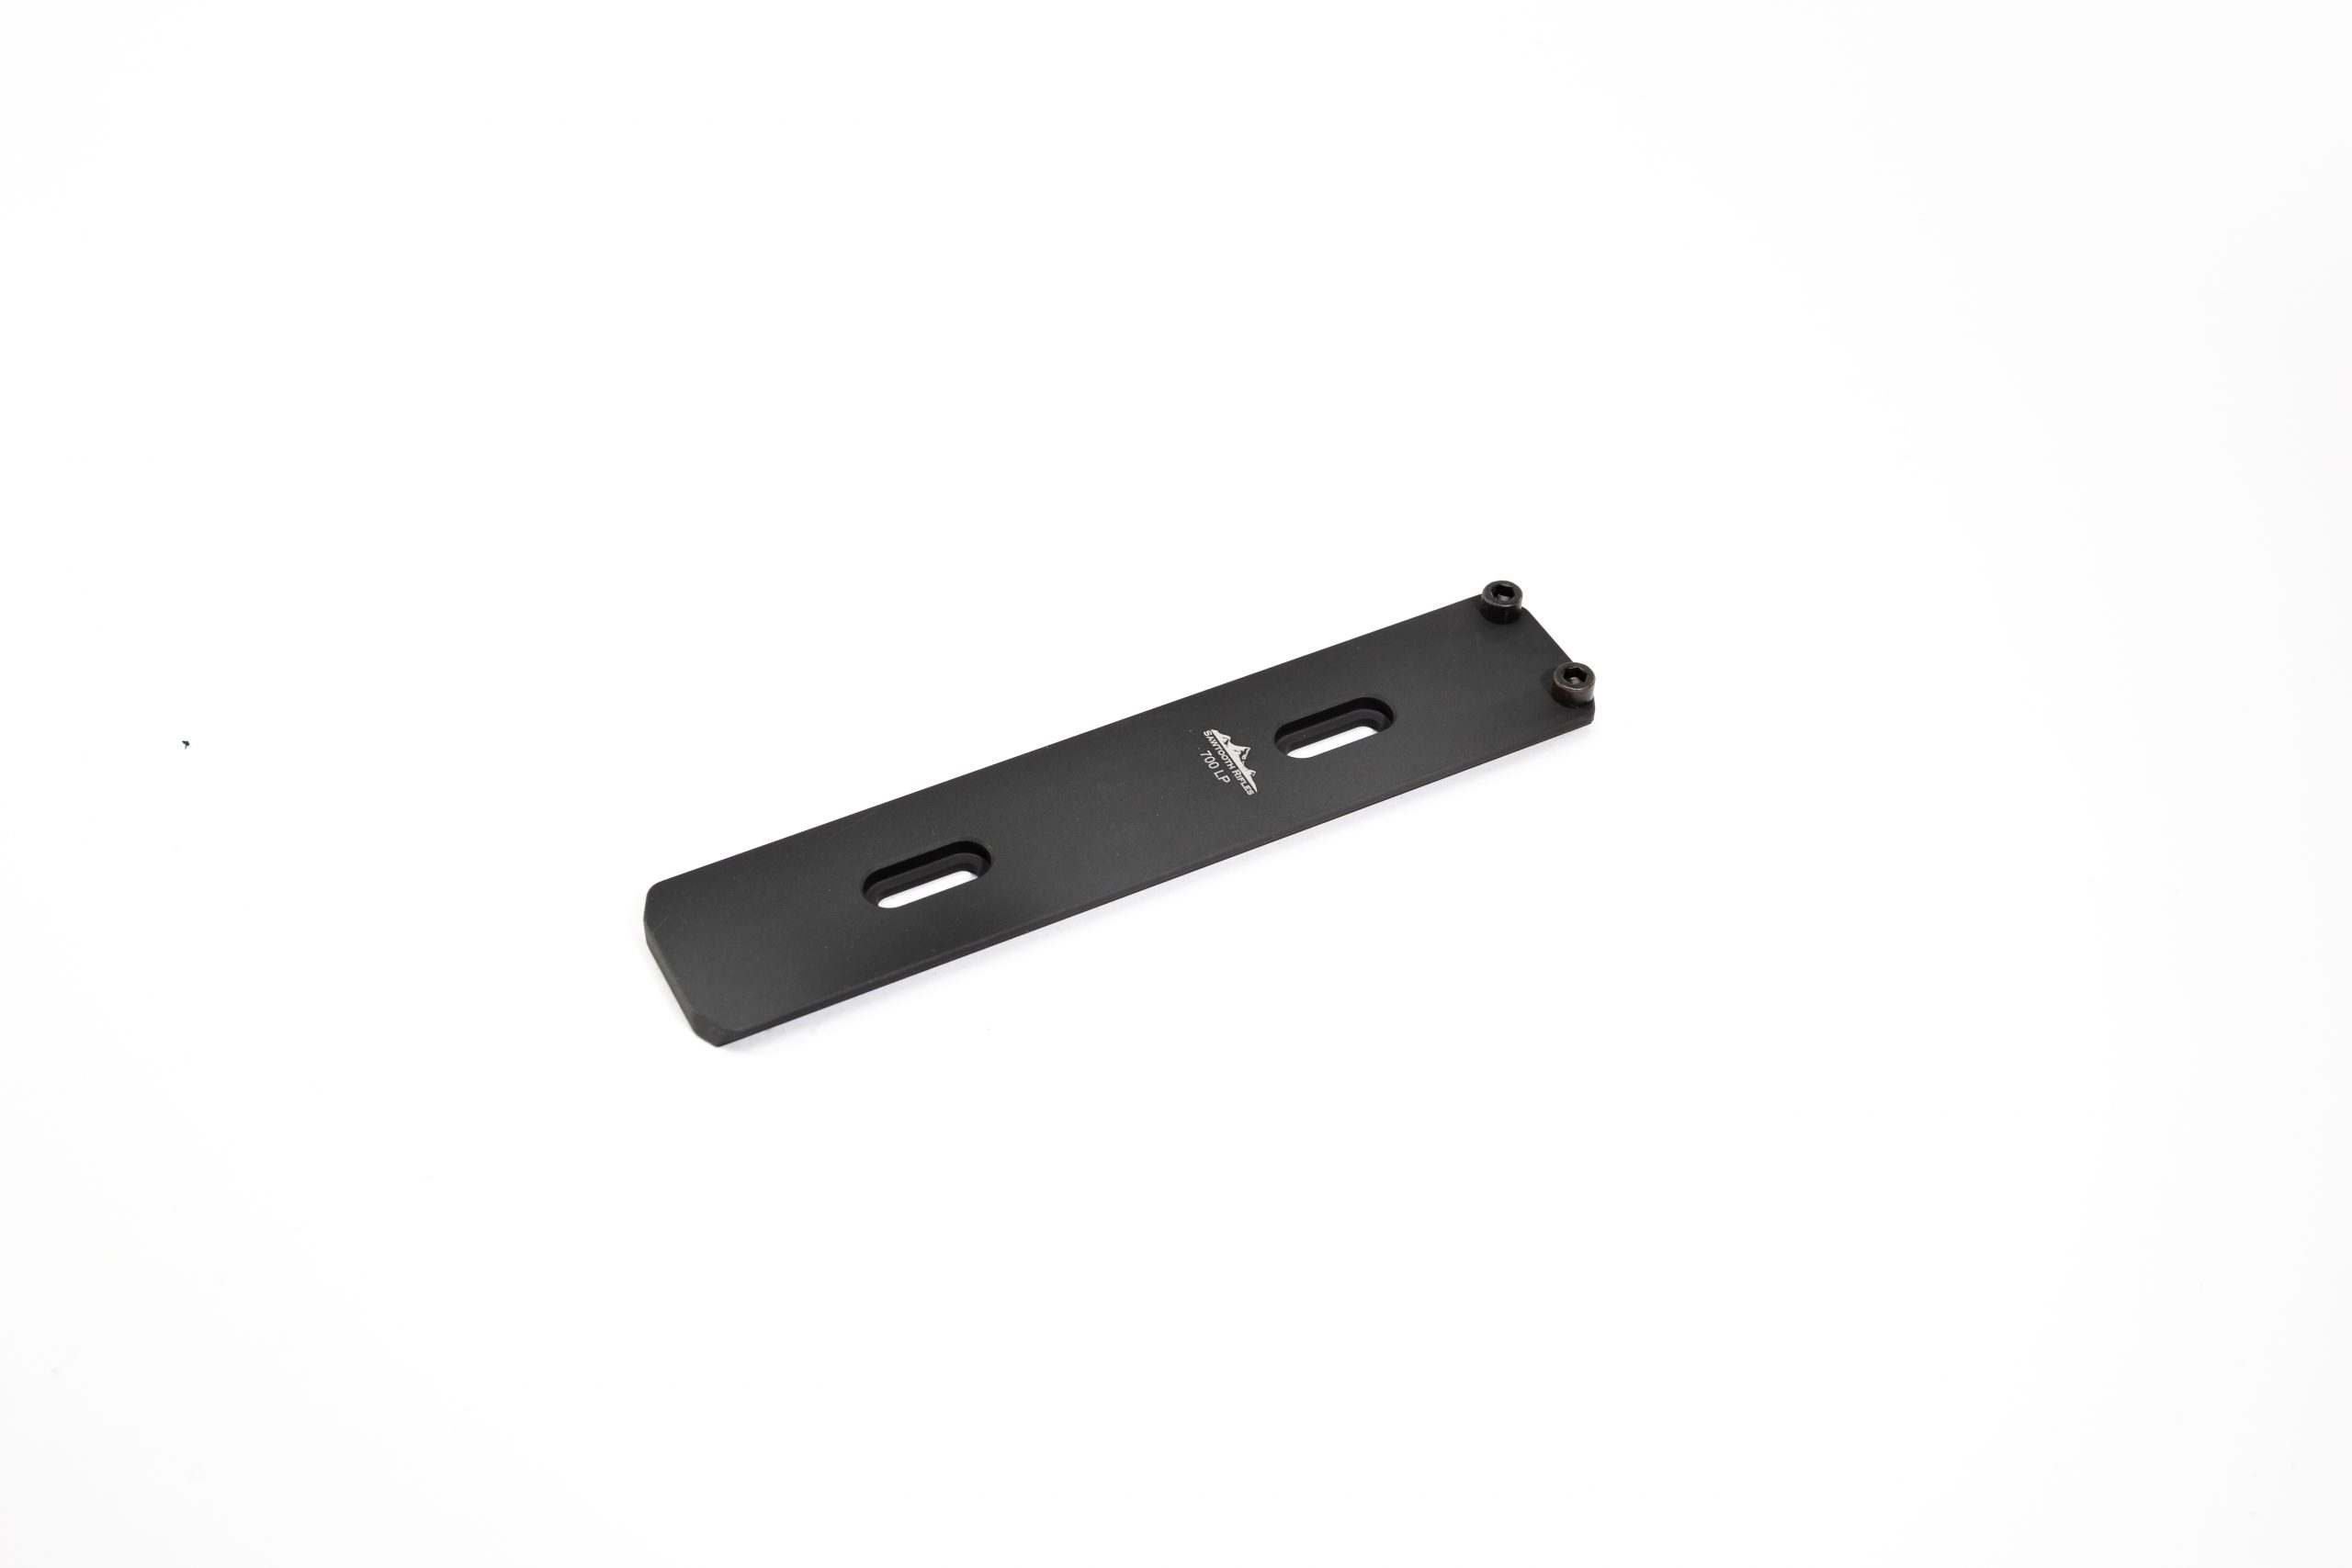 Universal Fit Dovetail Rail Rifle Stock Plate Arca Swiss